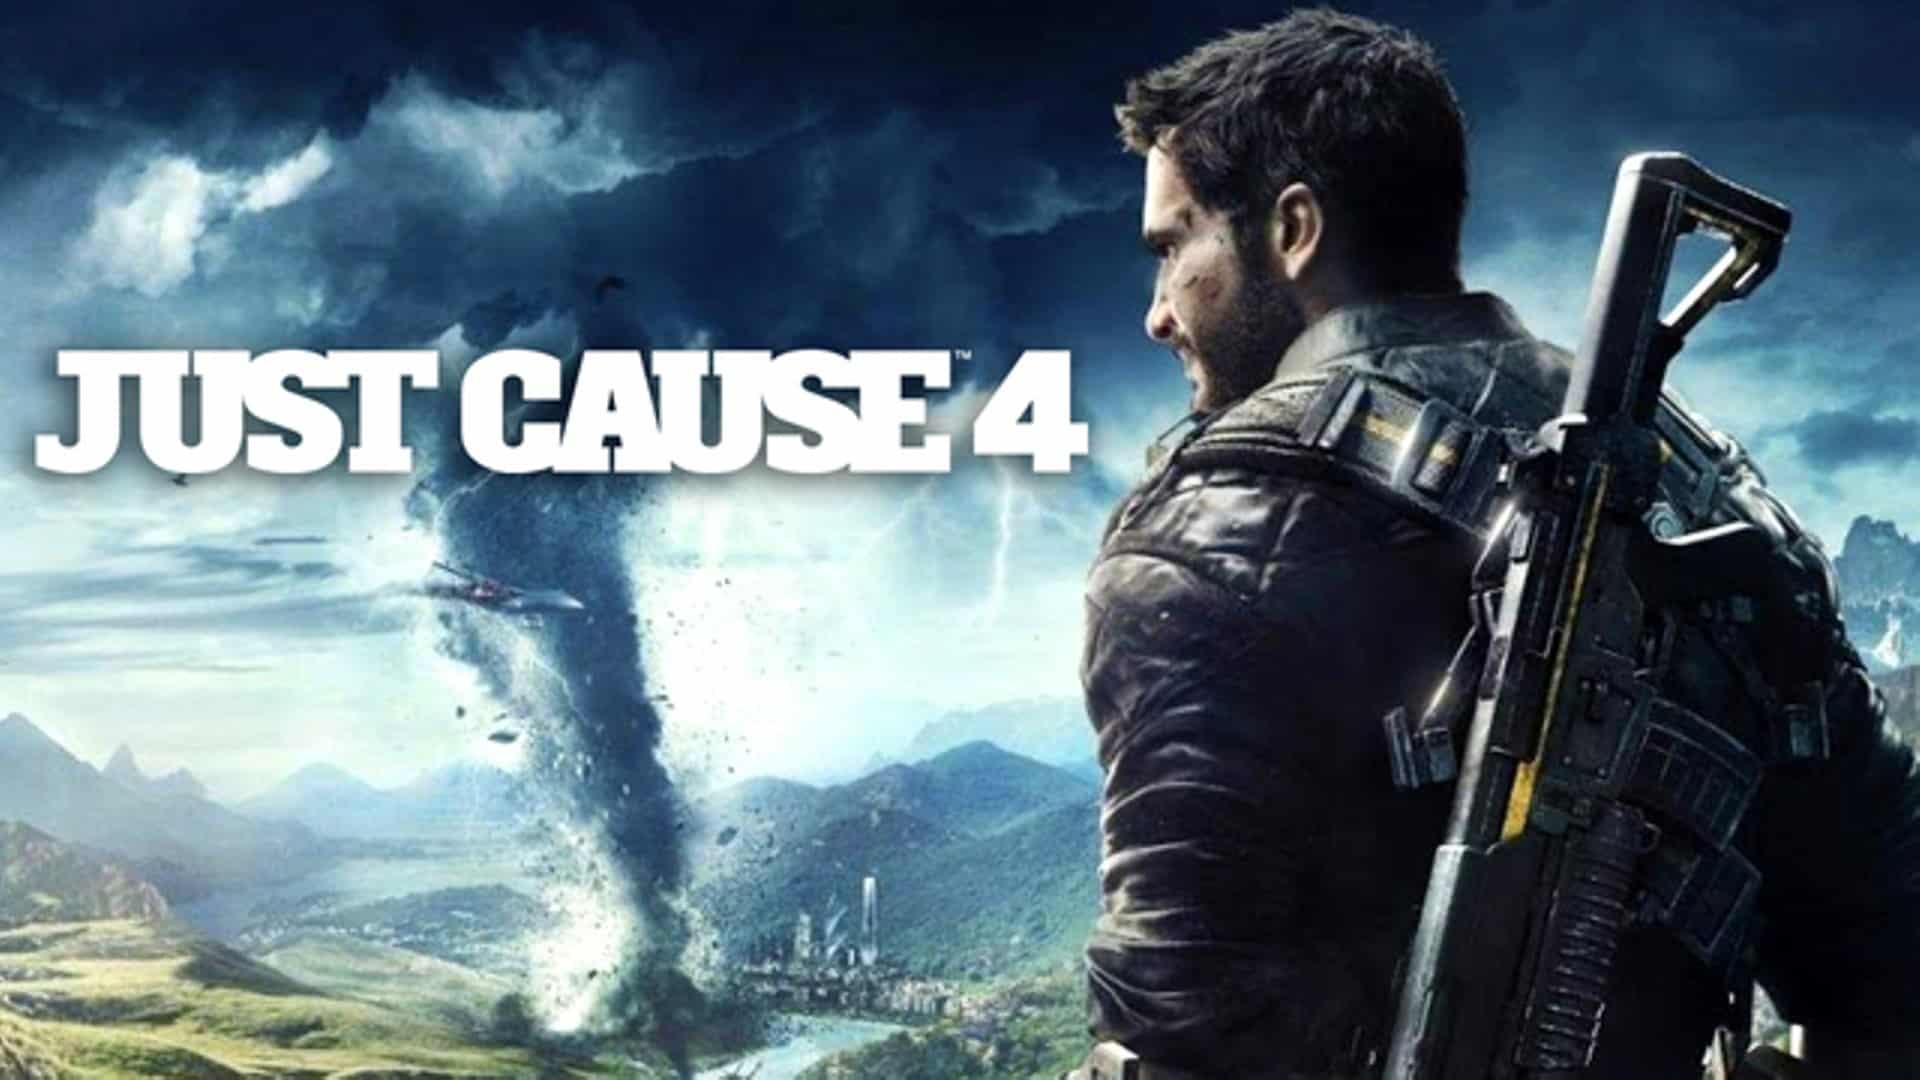 PC Just Cause 4 SaveGame 100% - Save File Download